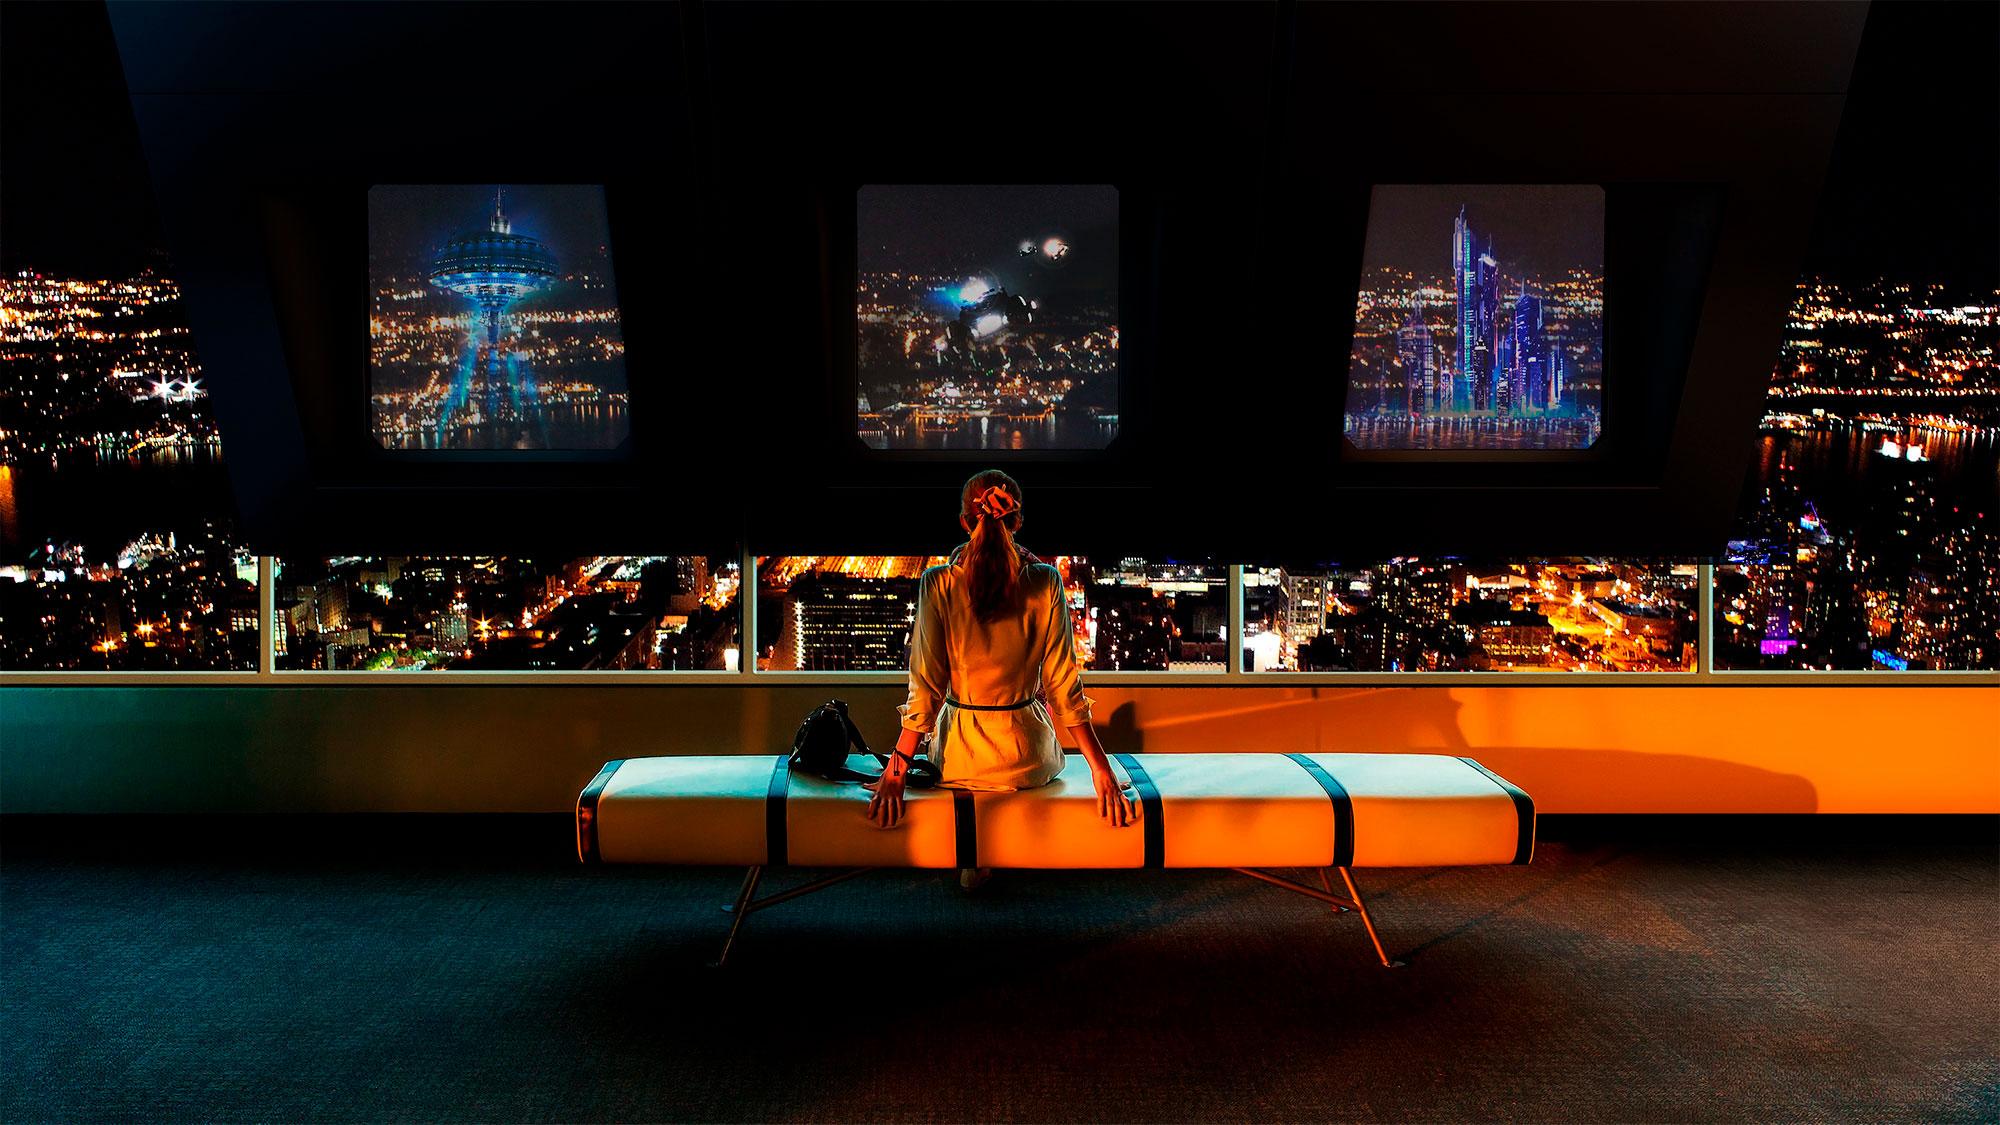 cityscape_1.jpg